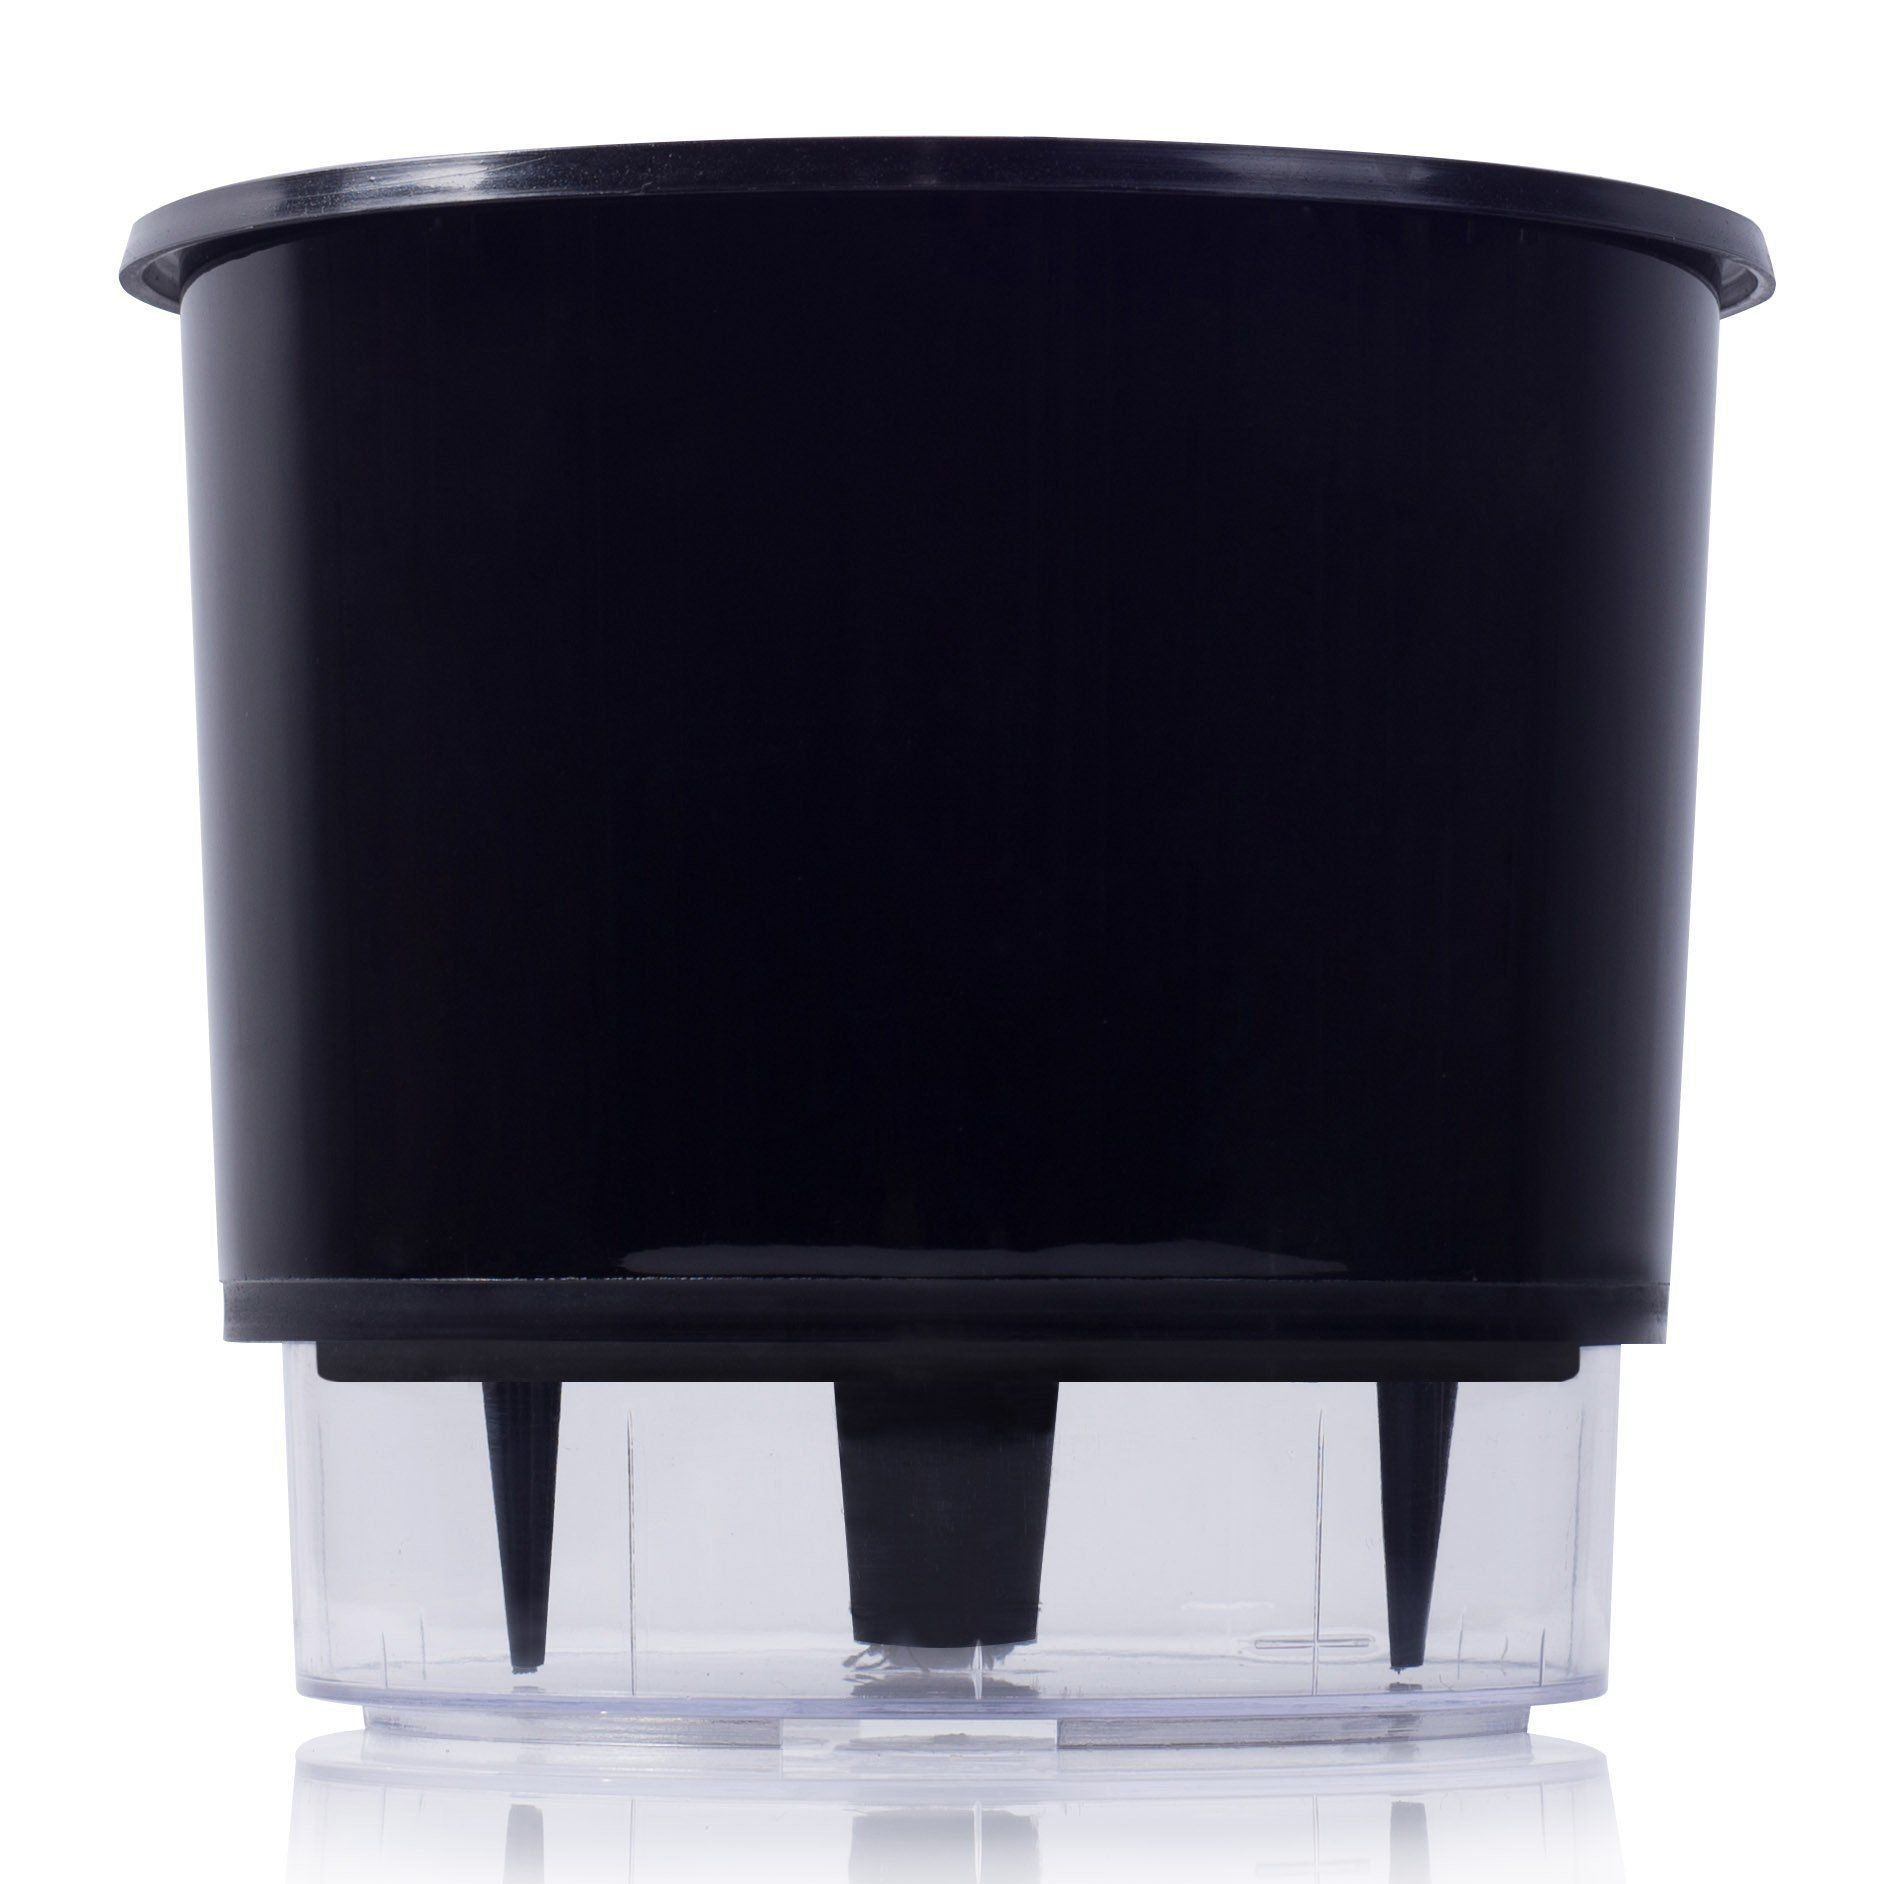 Kit 10 Vasos Autoirrigáveis N04 Grande Raiz Preto